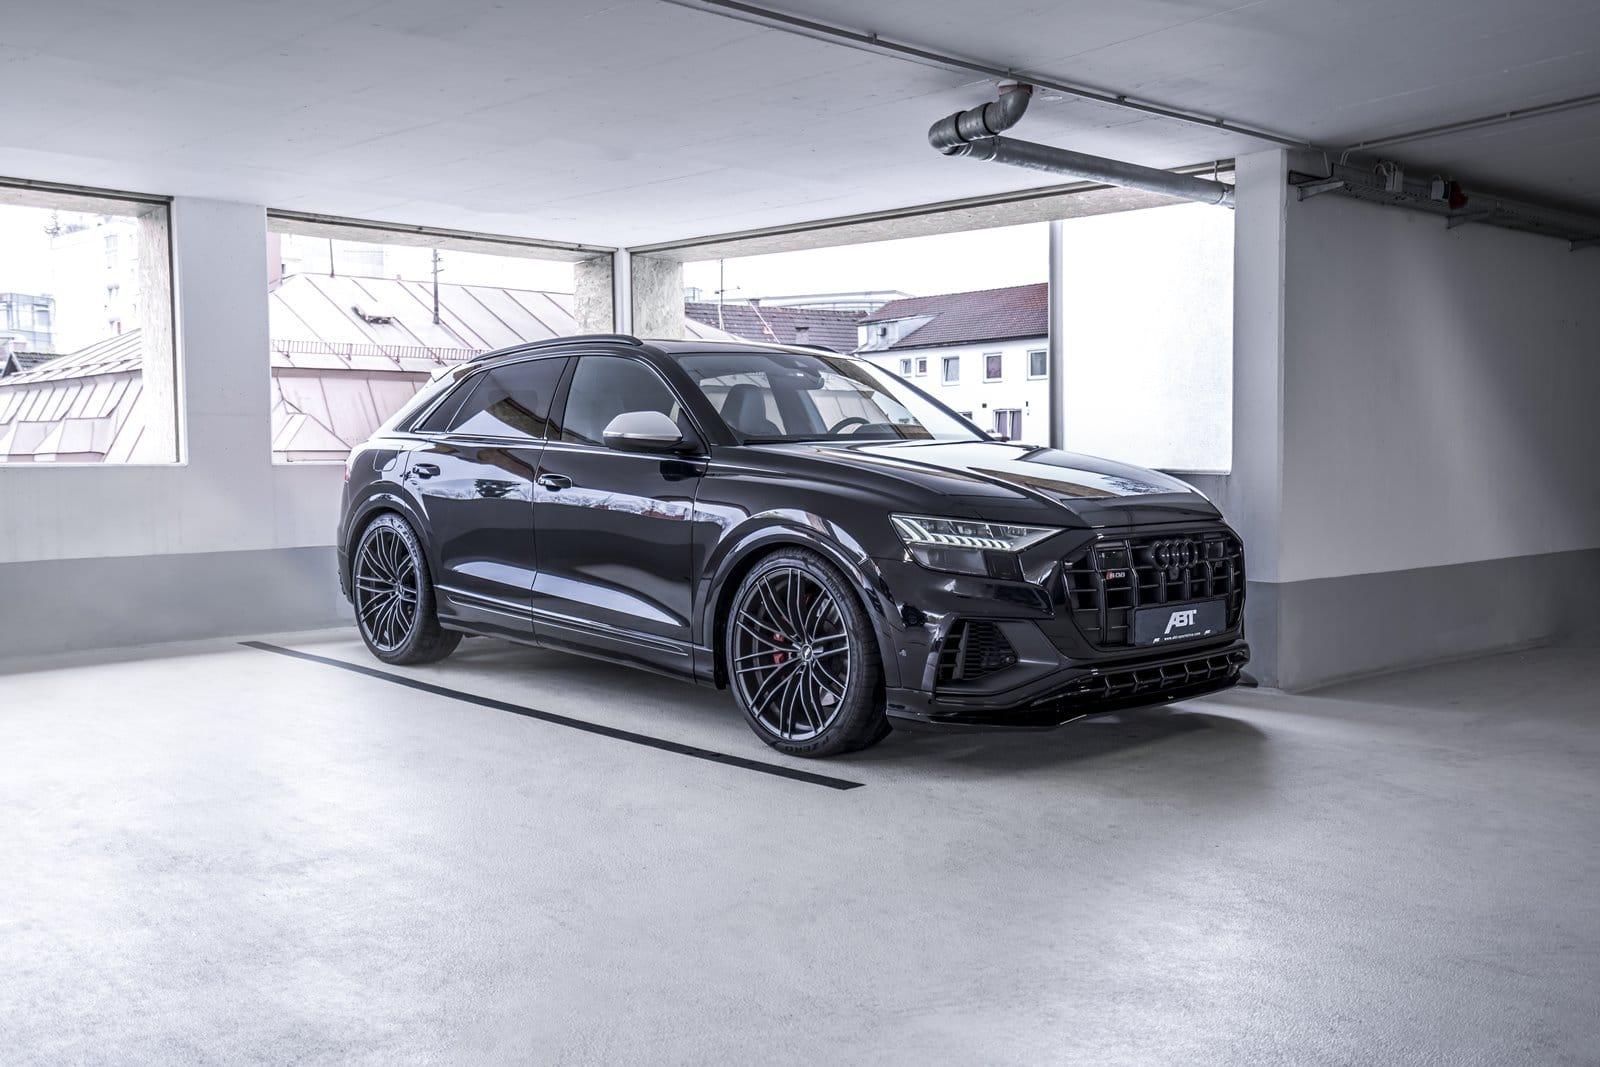 Audi SQ8 ABT Aero Package